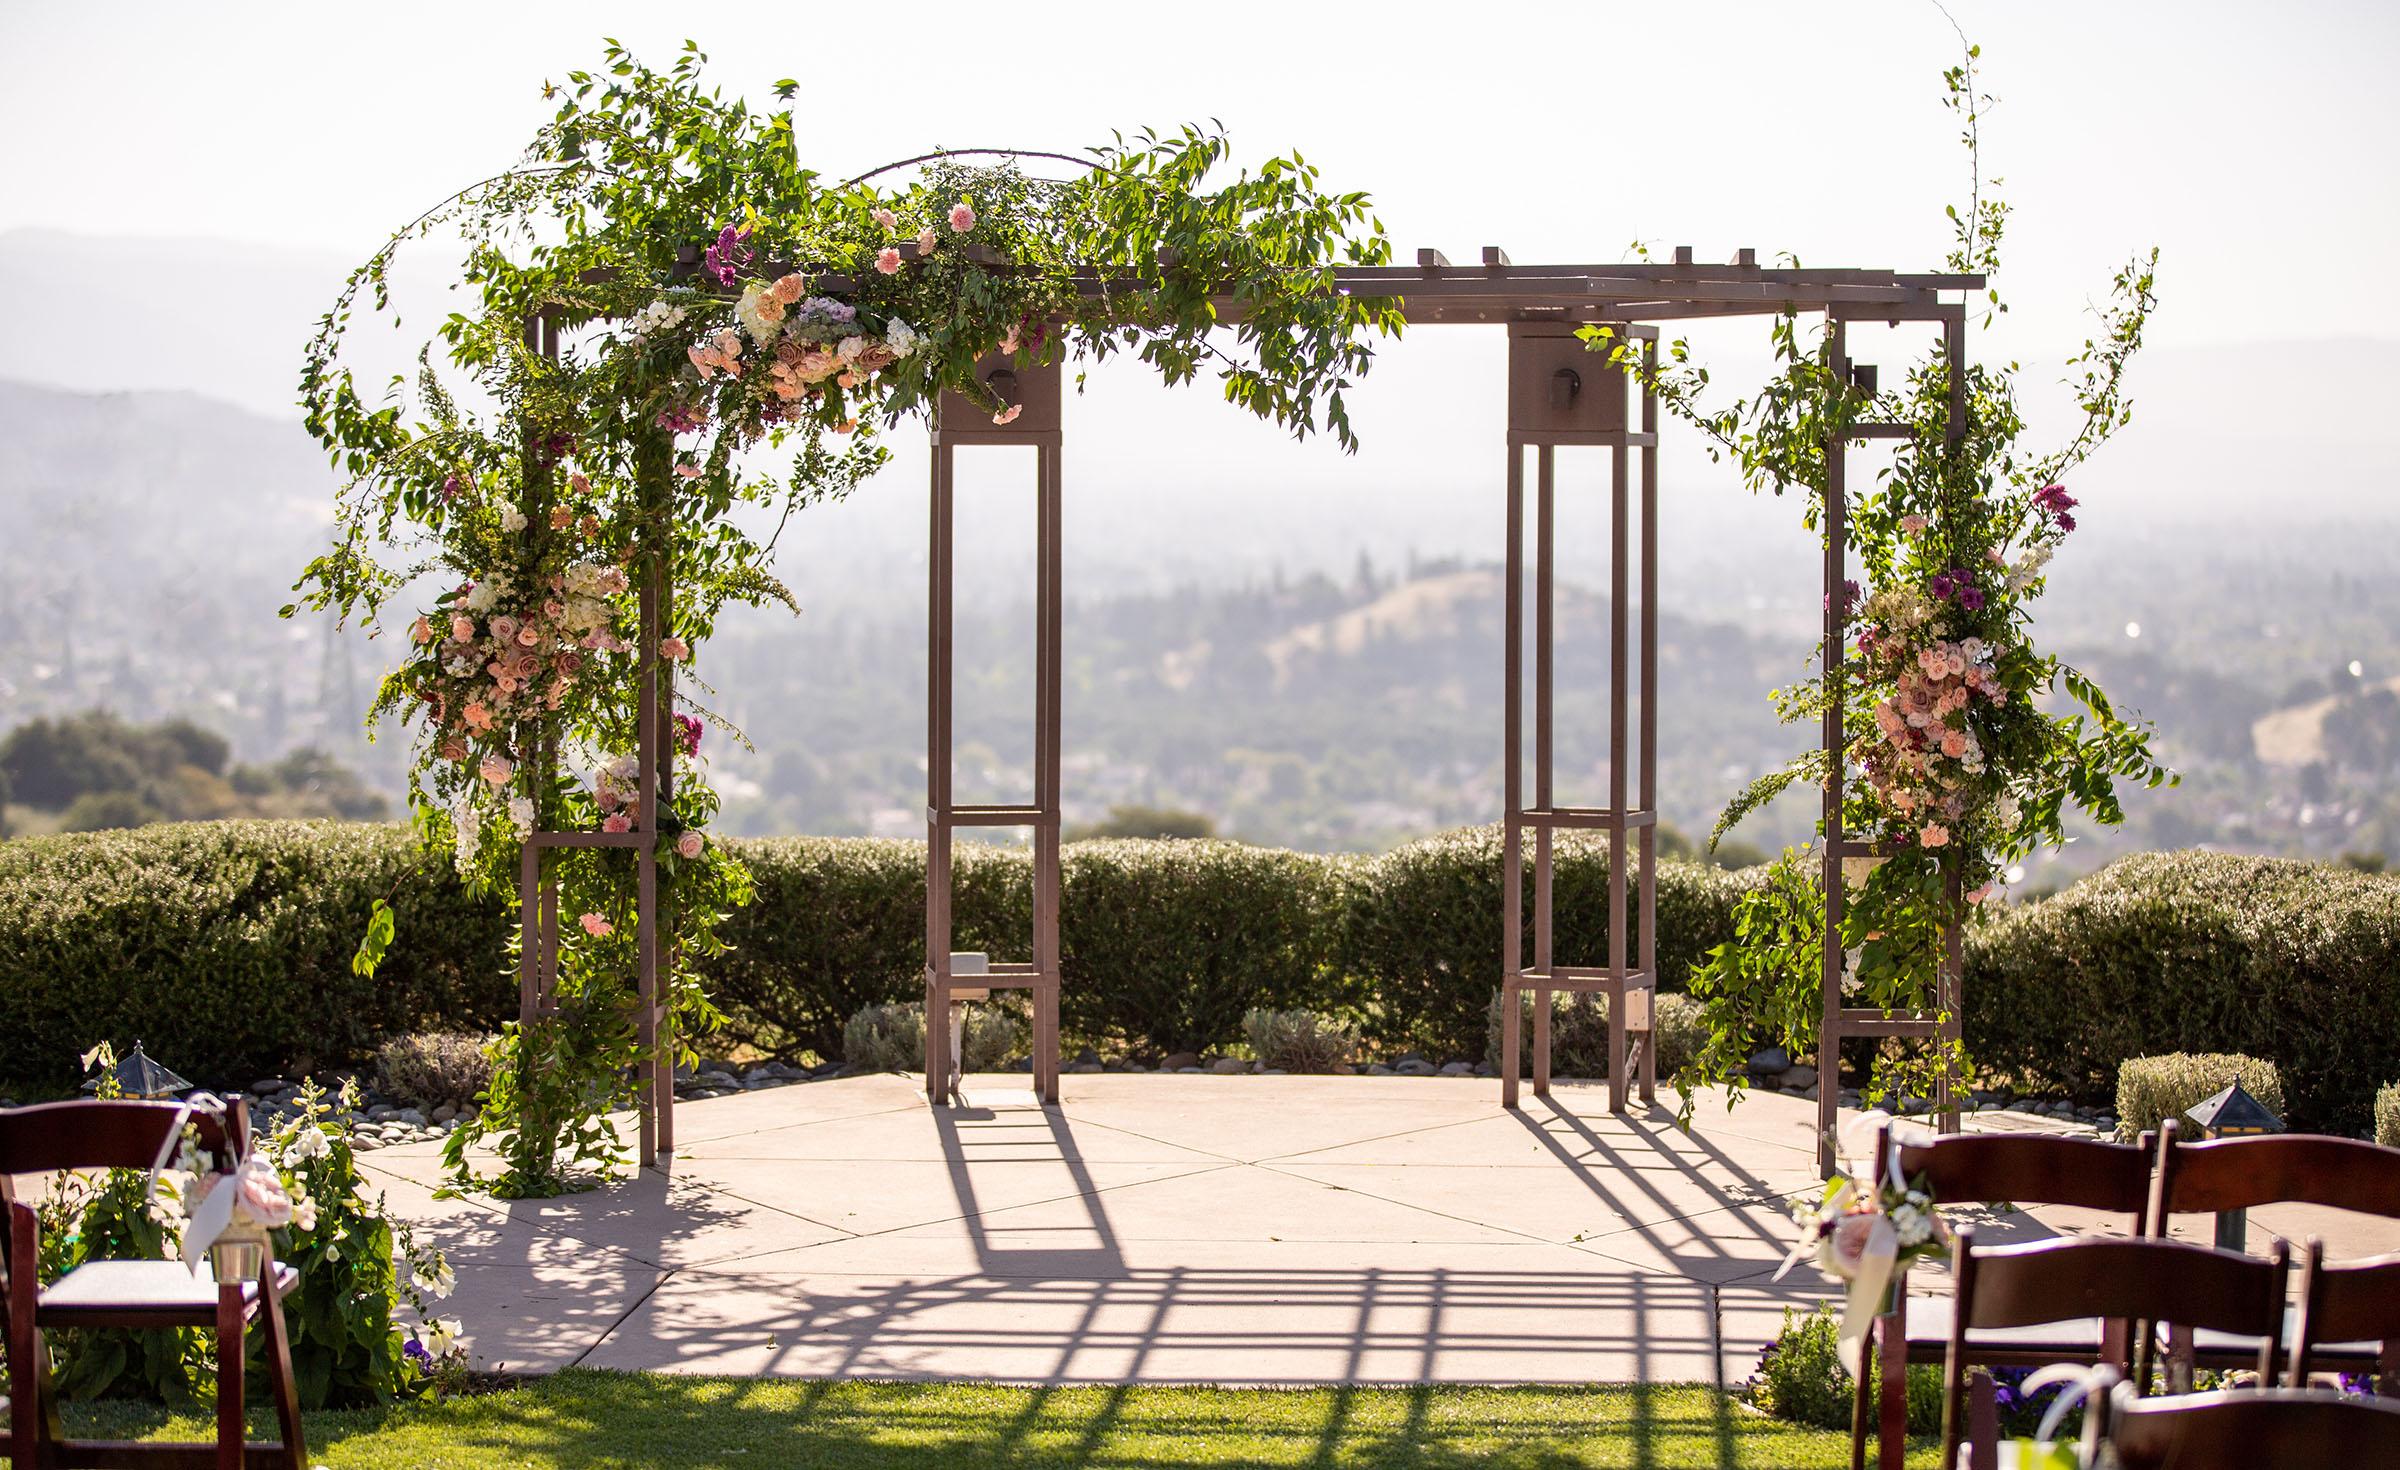 Scenic Ceremony Site - Boulder Ridge - Los Gatos, California - San Jose, California - Santa Clara County - Wedgewood Weddings